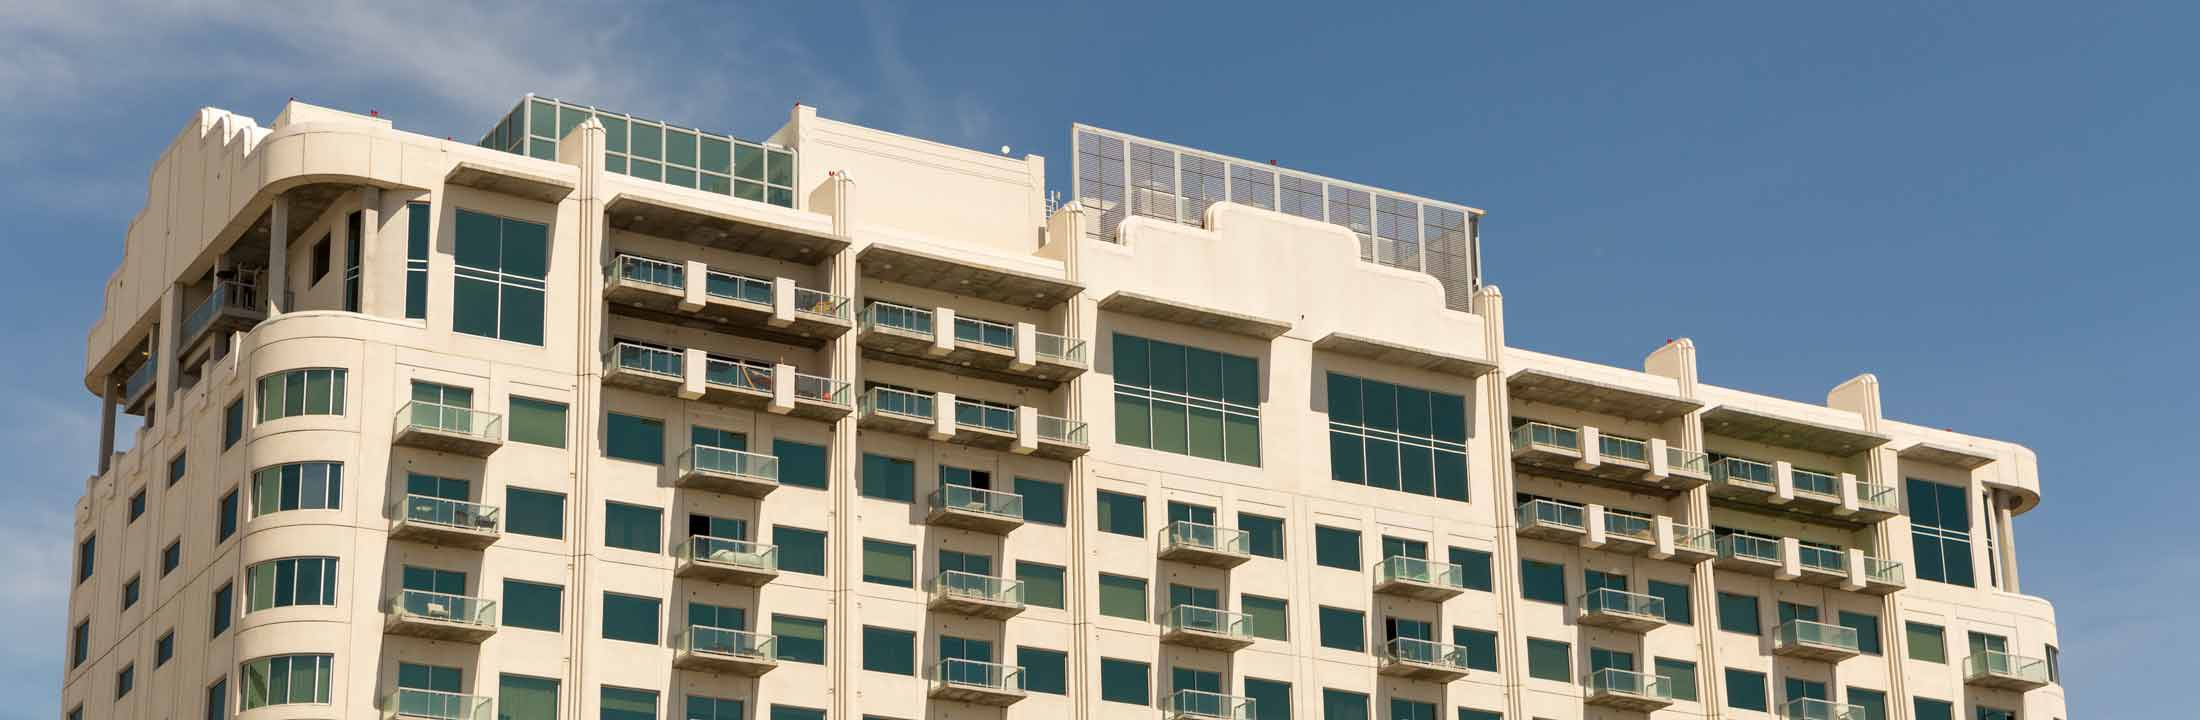 Soho-Loft-Highrise-Condos-For-Sale-Las-Vegas